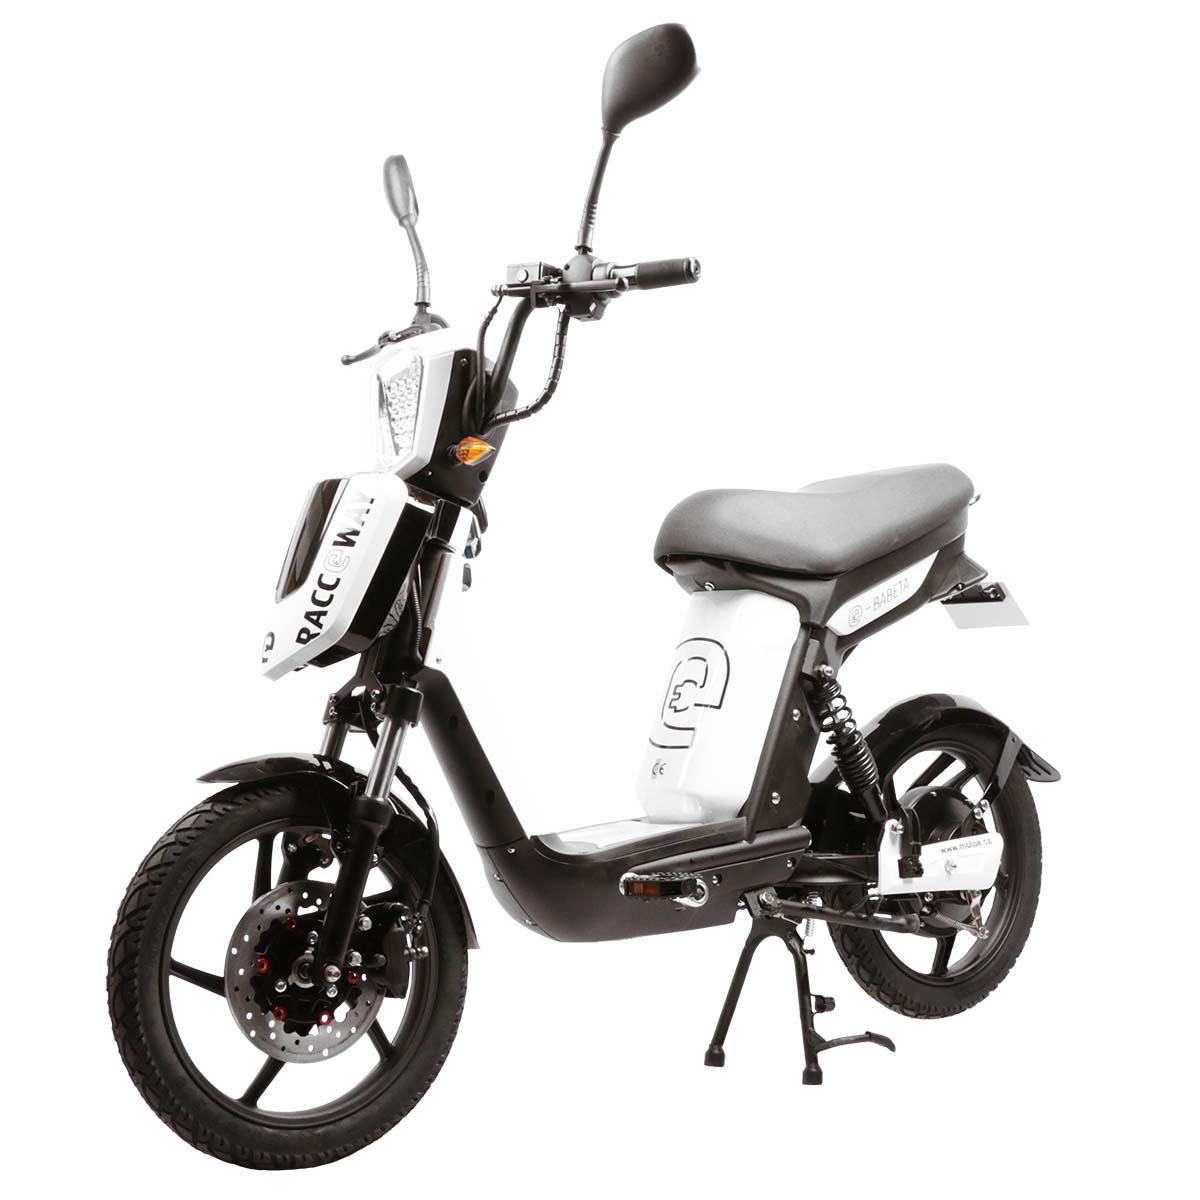 Elektrický motocykl RACCEWAY E-BABETA Barva: Bílá